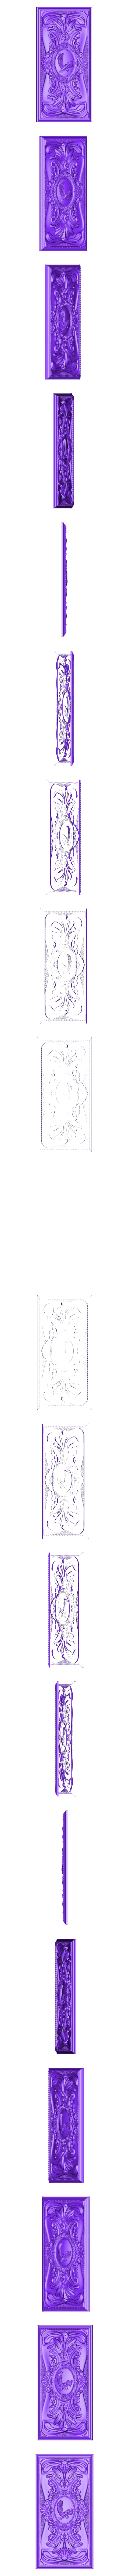 nardy8.stl Download free STL file Eagle frame cnc • 3D printable template, STLmodelforfree